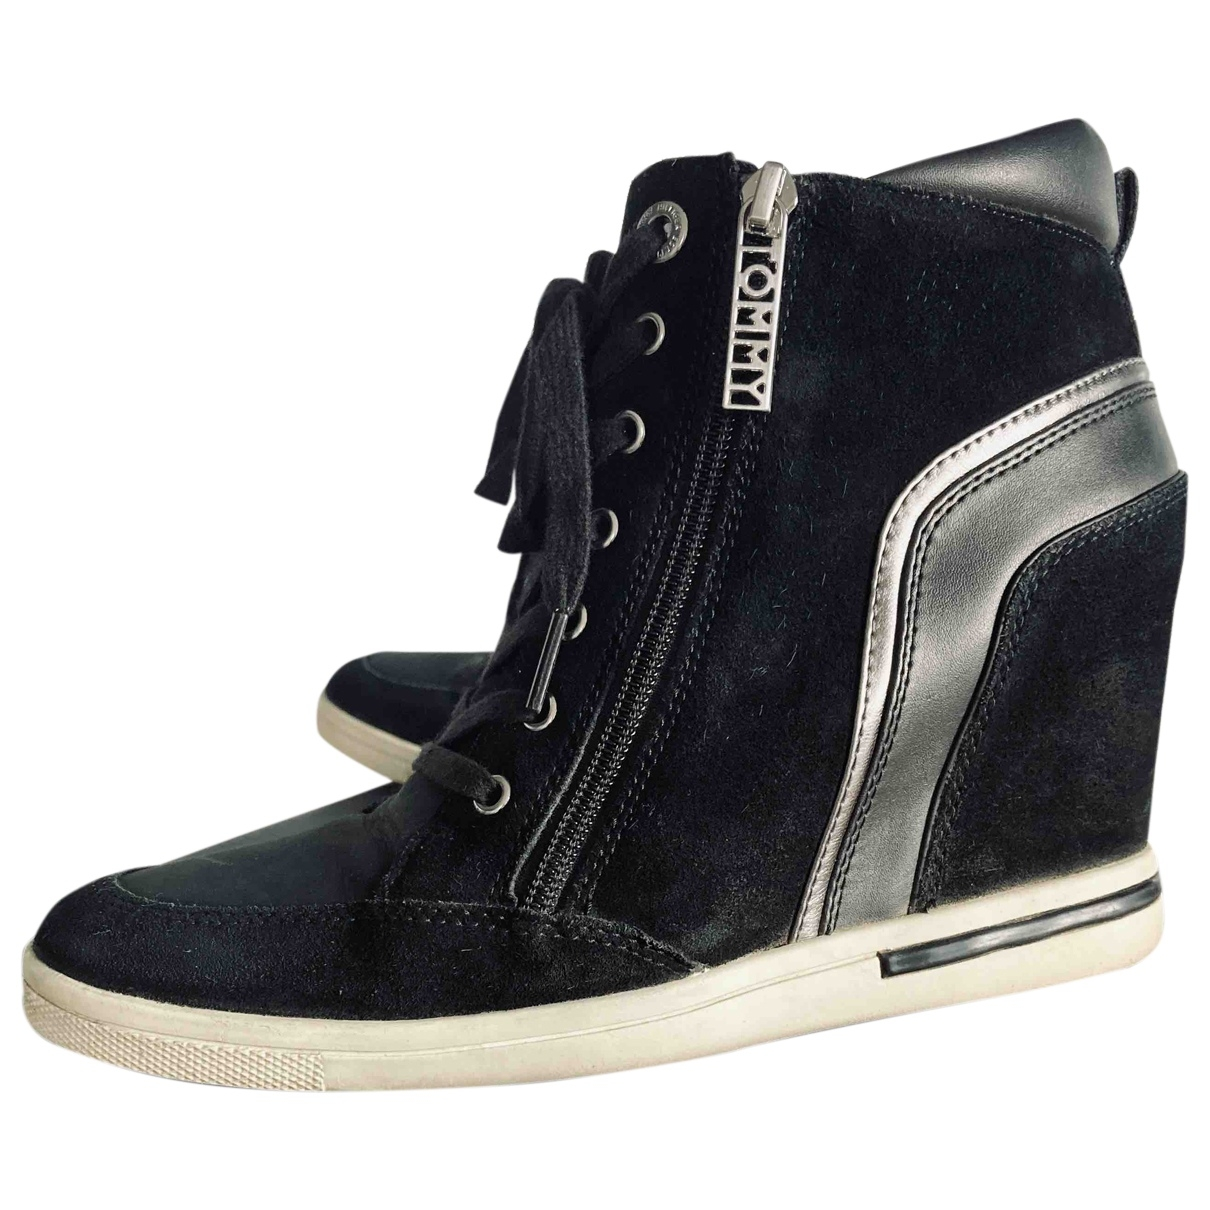 Tommy Hilfiger \N Sneakers in  Schwarz Samt